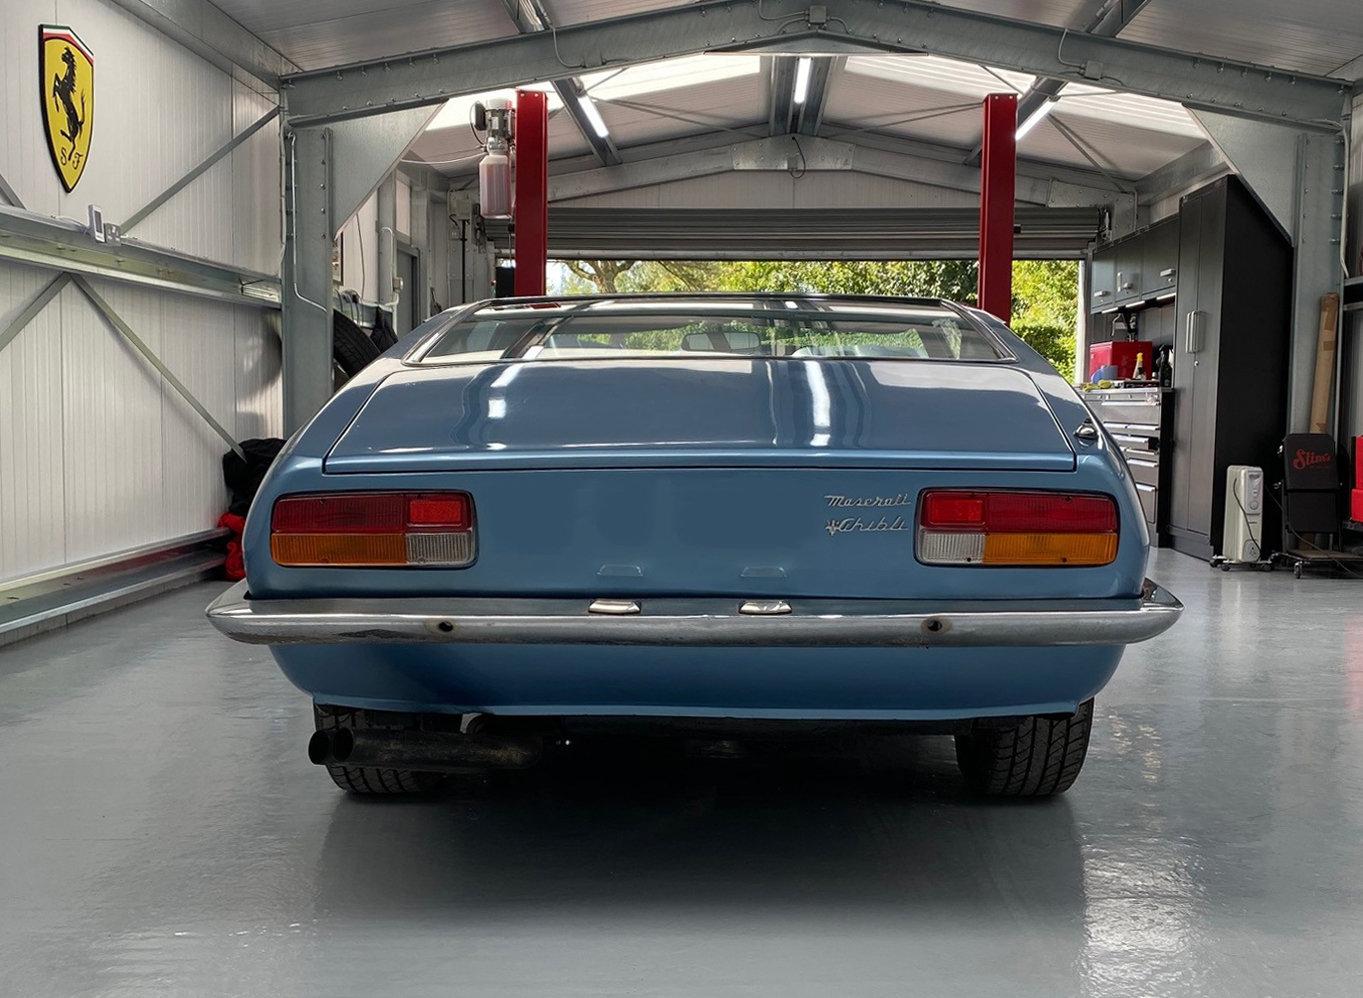 1972 Maserati Ghibli 4.7 For Sale (picture 4 of 6)